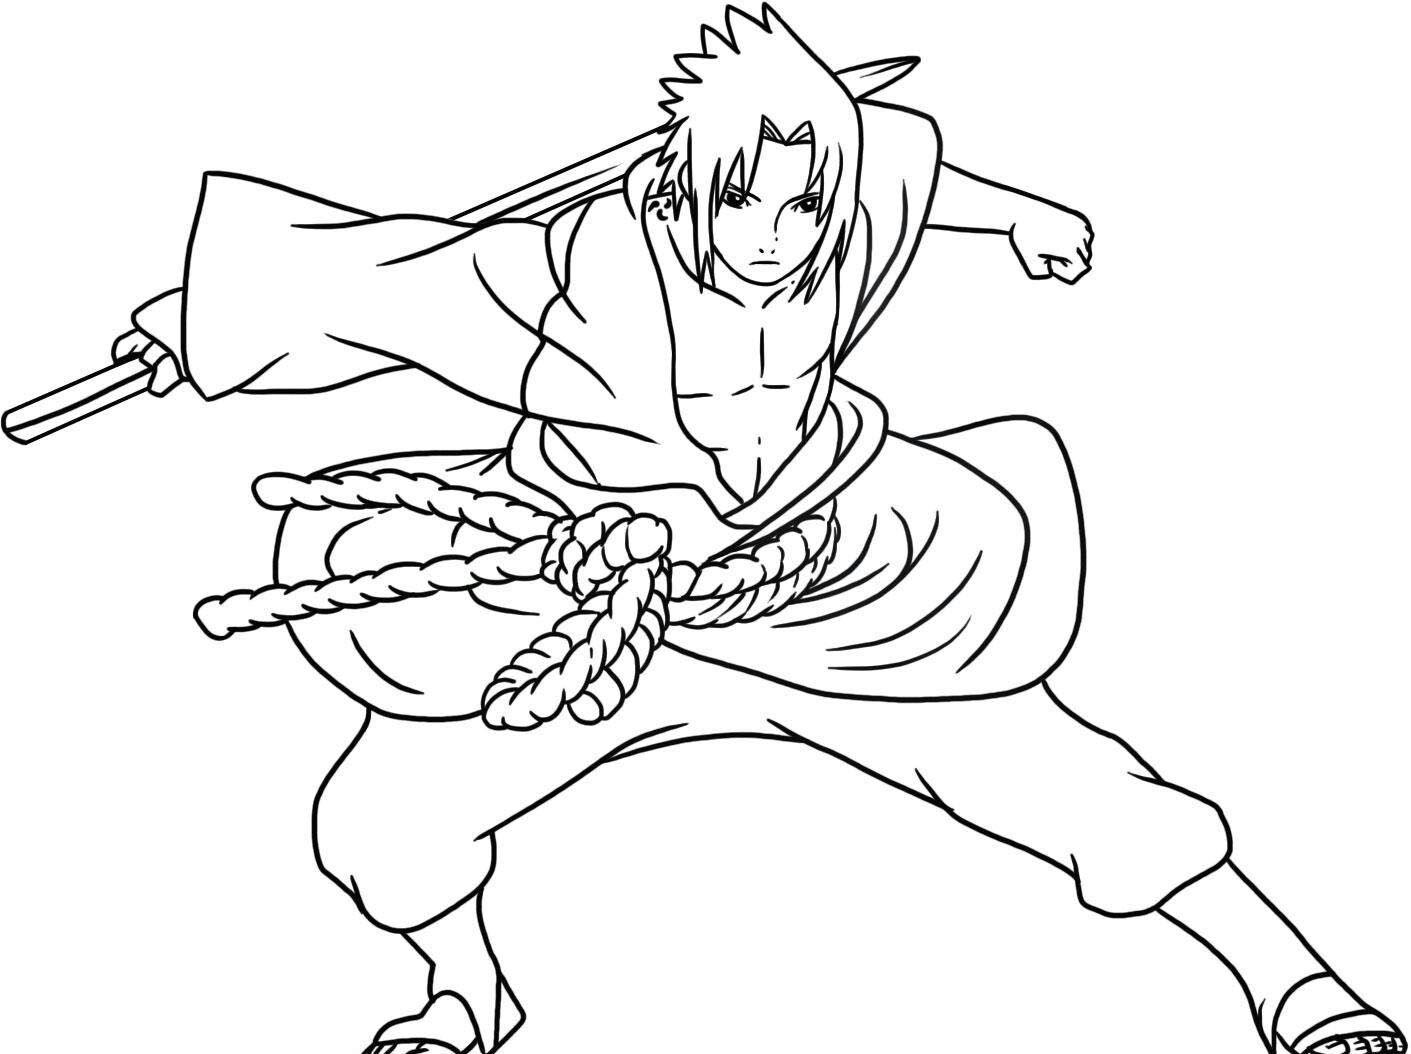 Naruto And Sasuke Coloring Pages